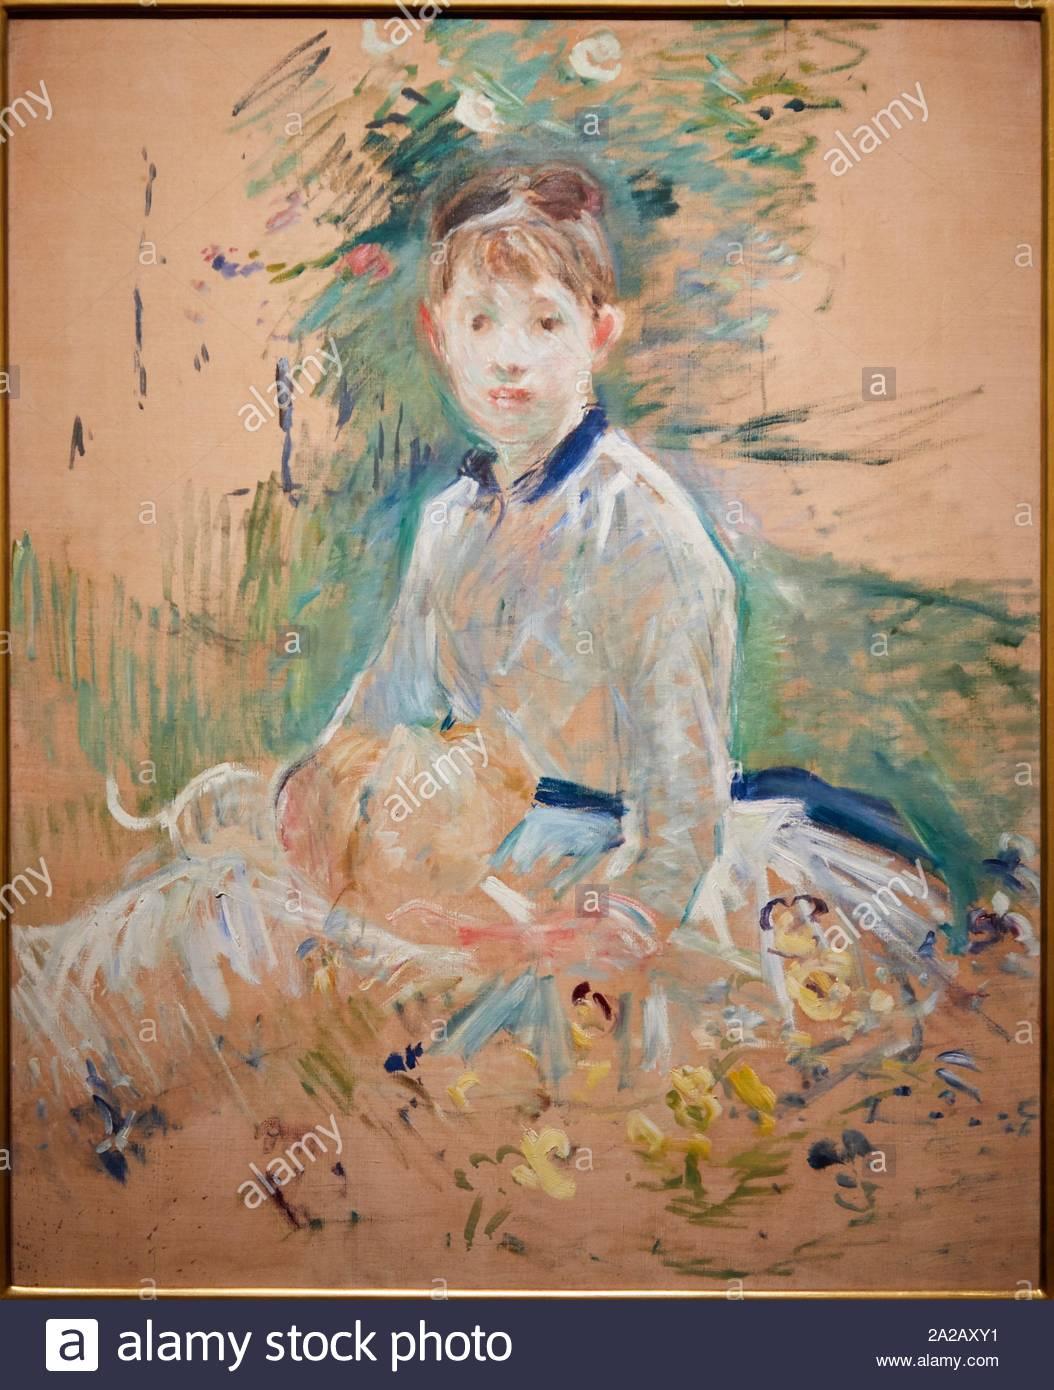 portrait de mlle lambert dit aussi isabelle au jardin 1885 berthe morisot 1841 1895 2A2AXY1